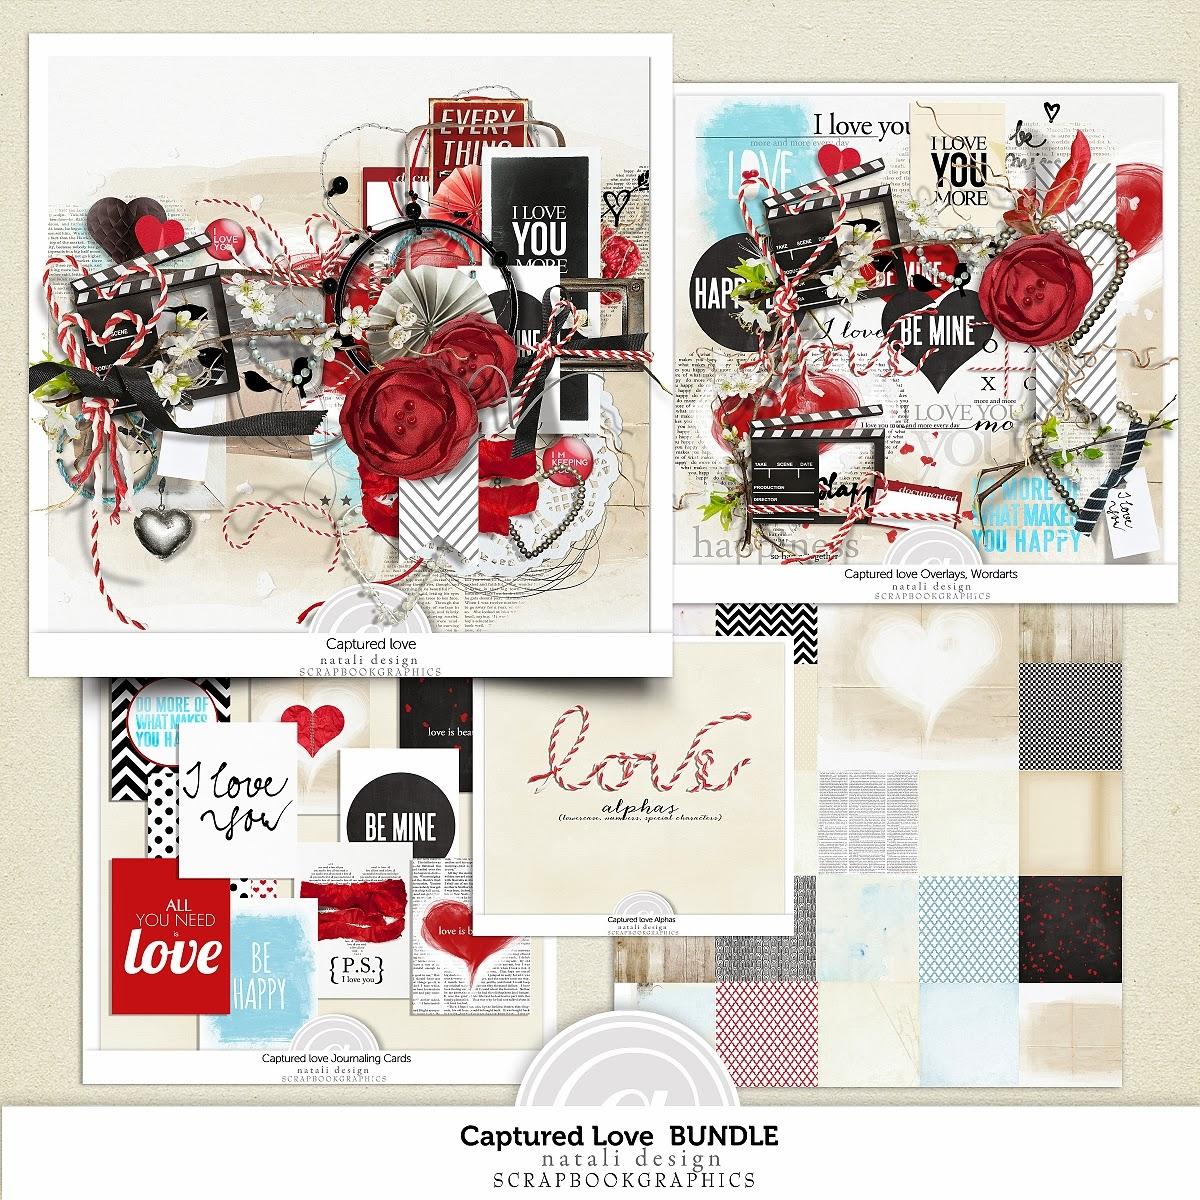 http://shop.scrapbookgraphics.com/Captured-Love-Bundle.html